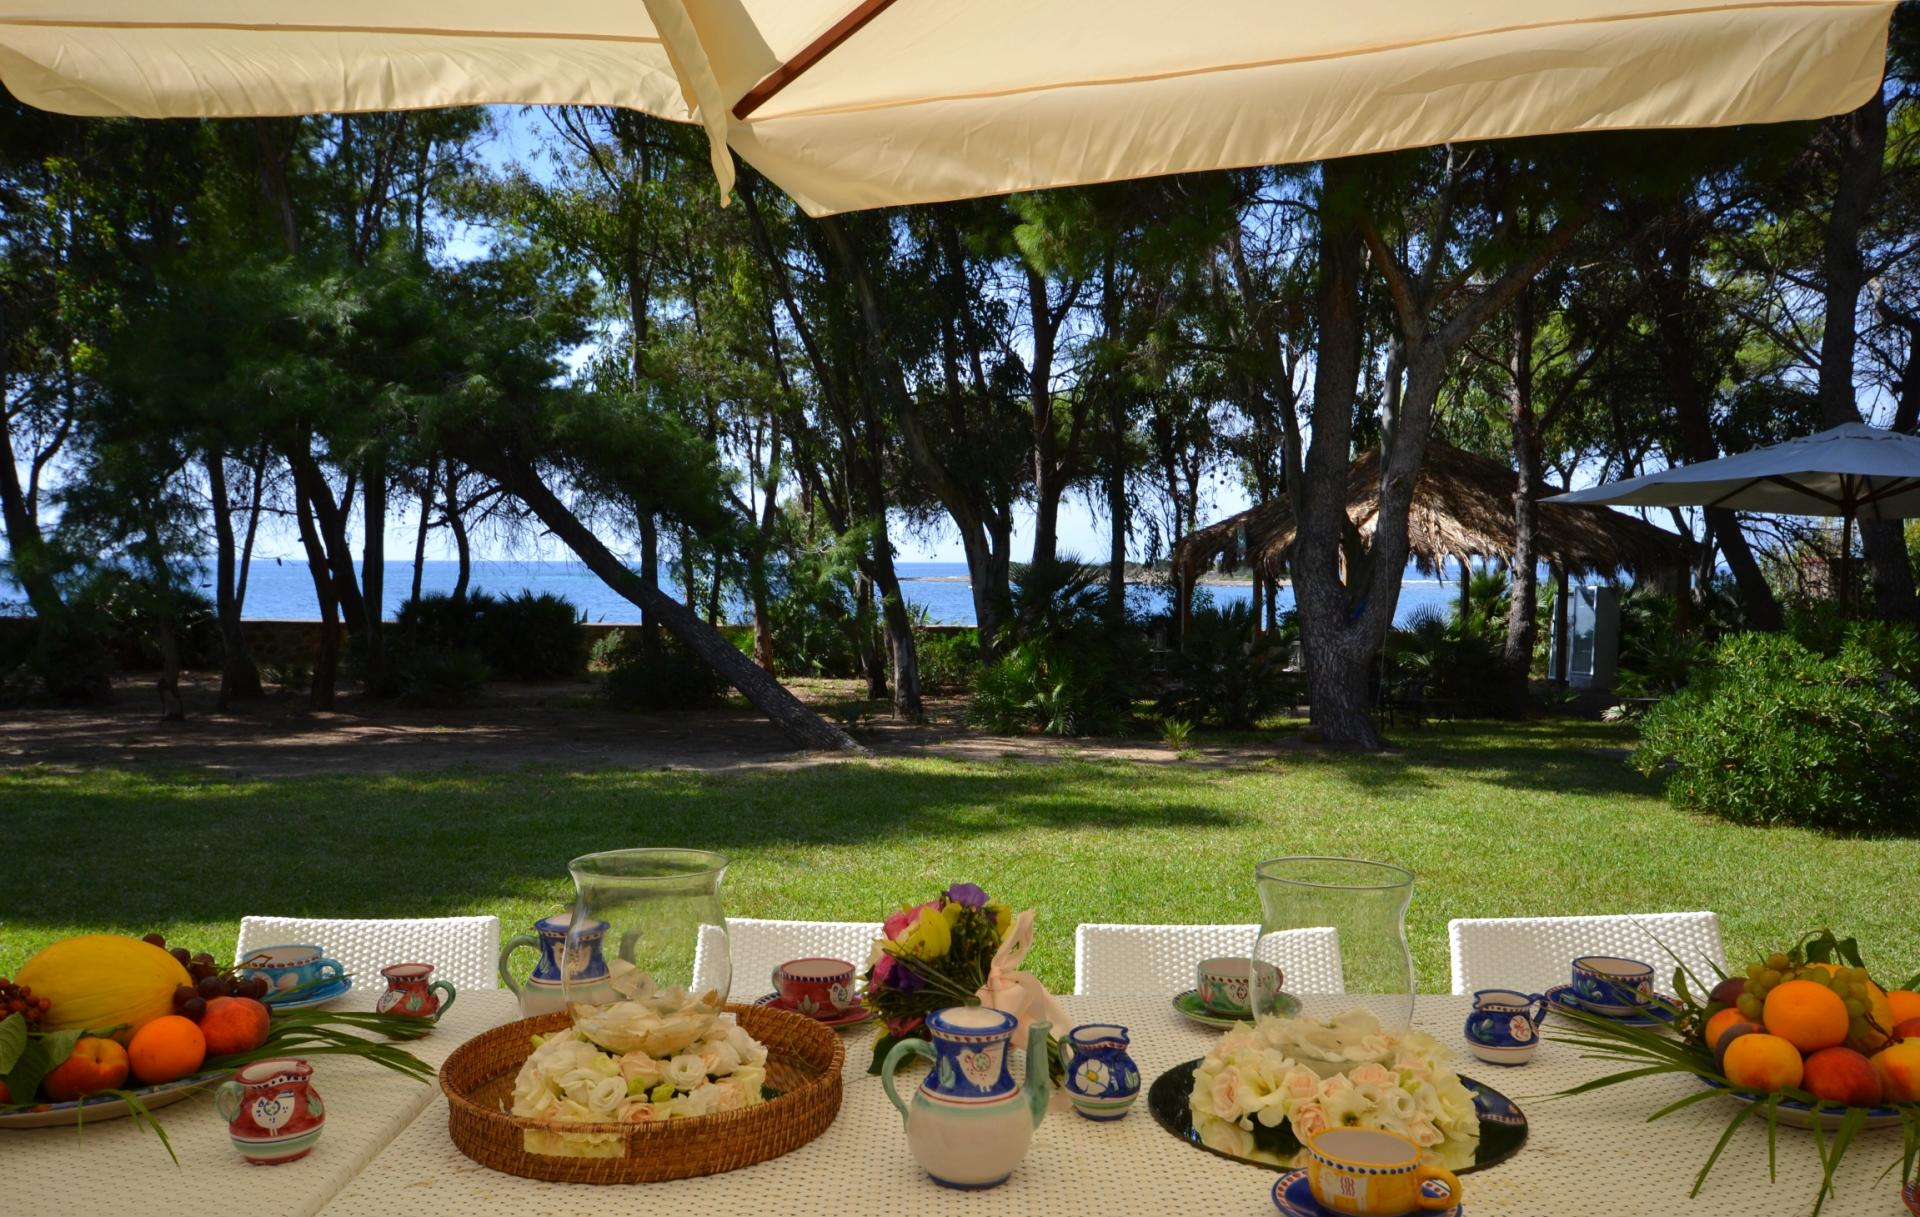 Garden Dining Table, Faro di Ulisse, Castellabate, Amalfi Coast Campania.